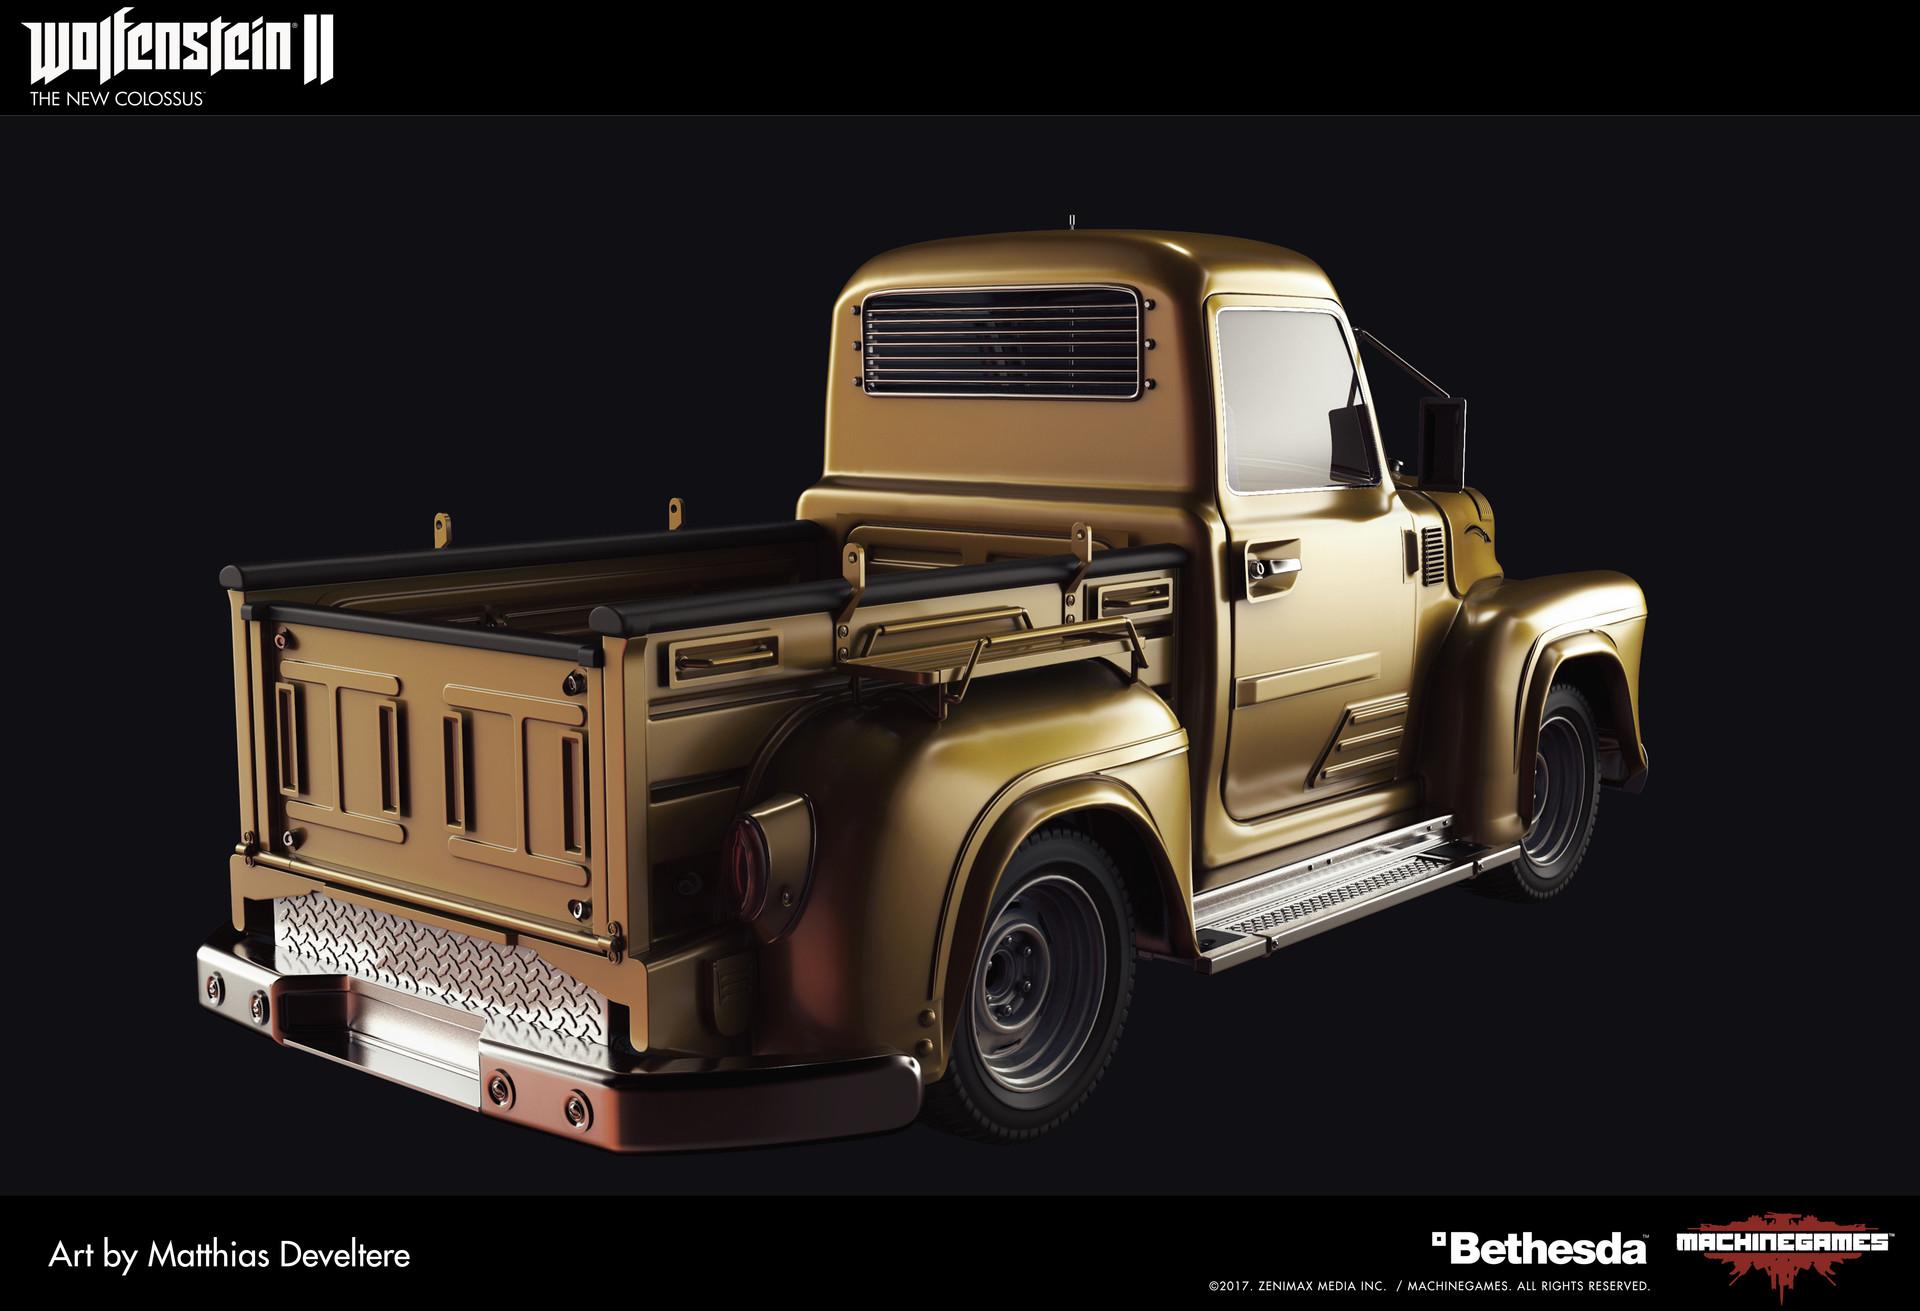 Matthias develtere civilian truck 2